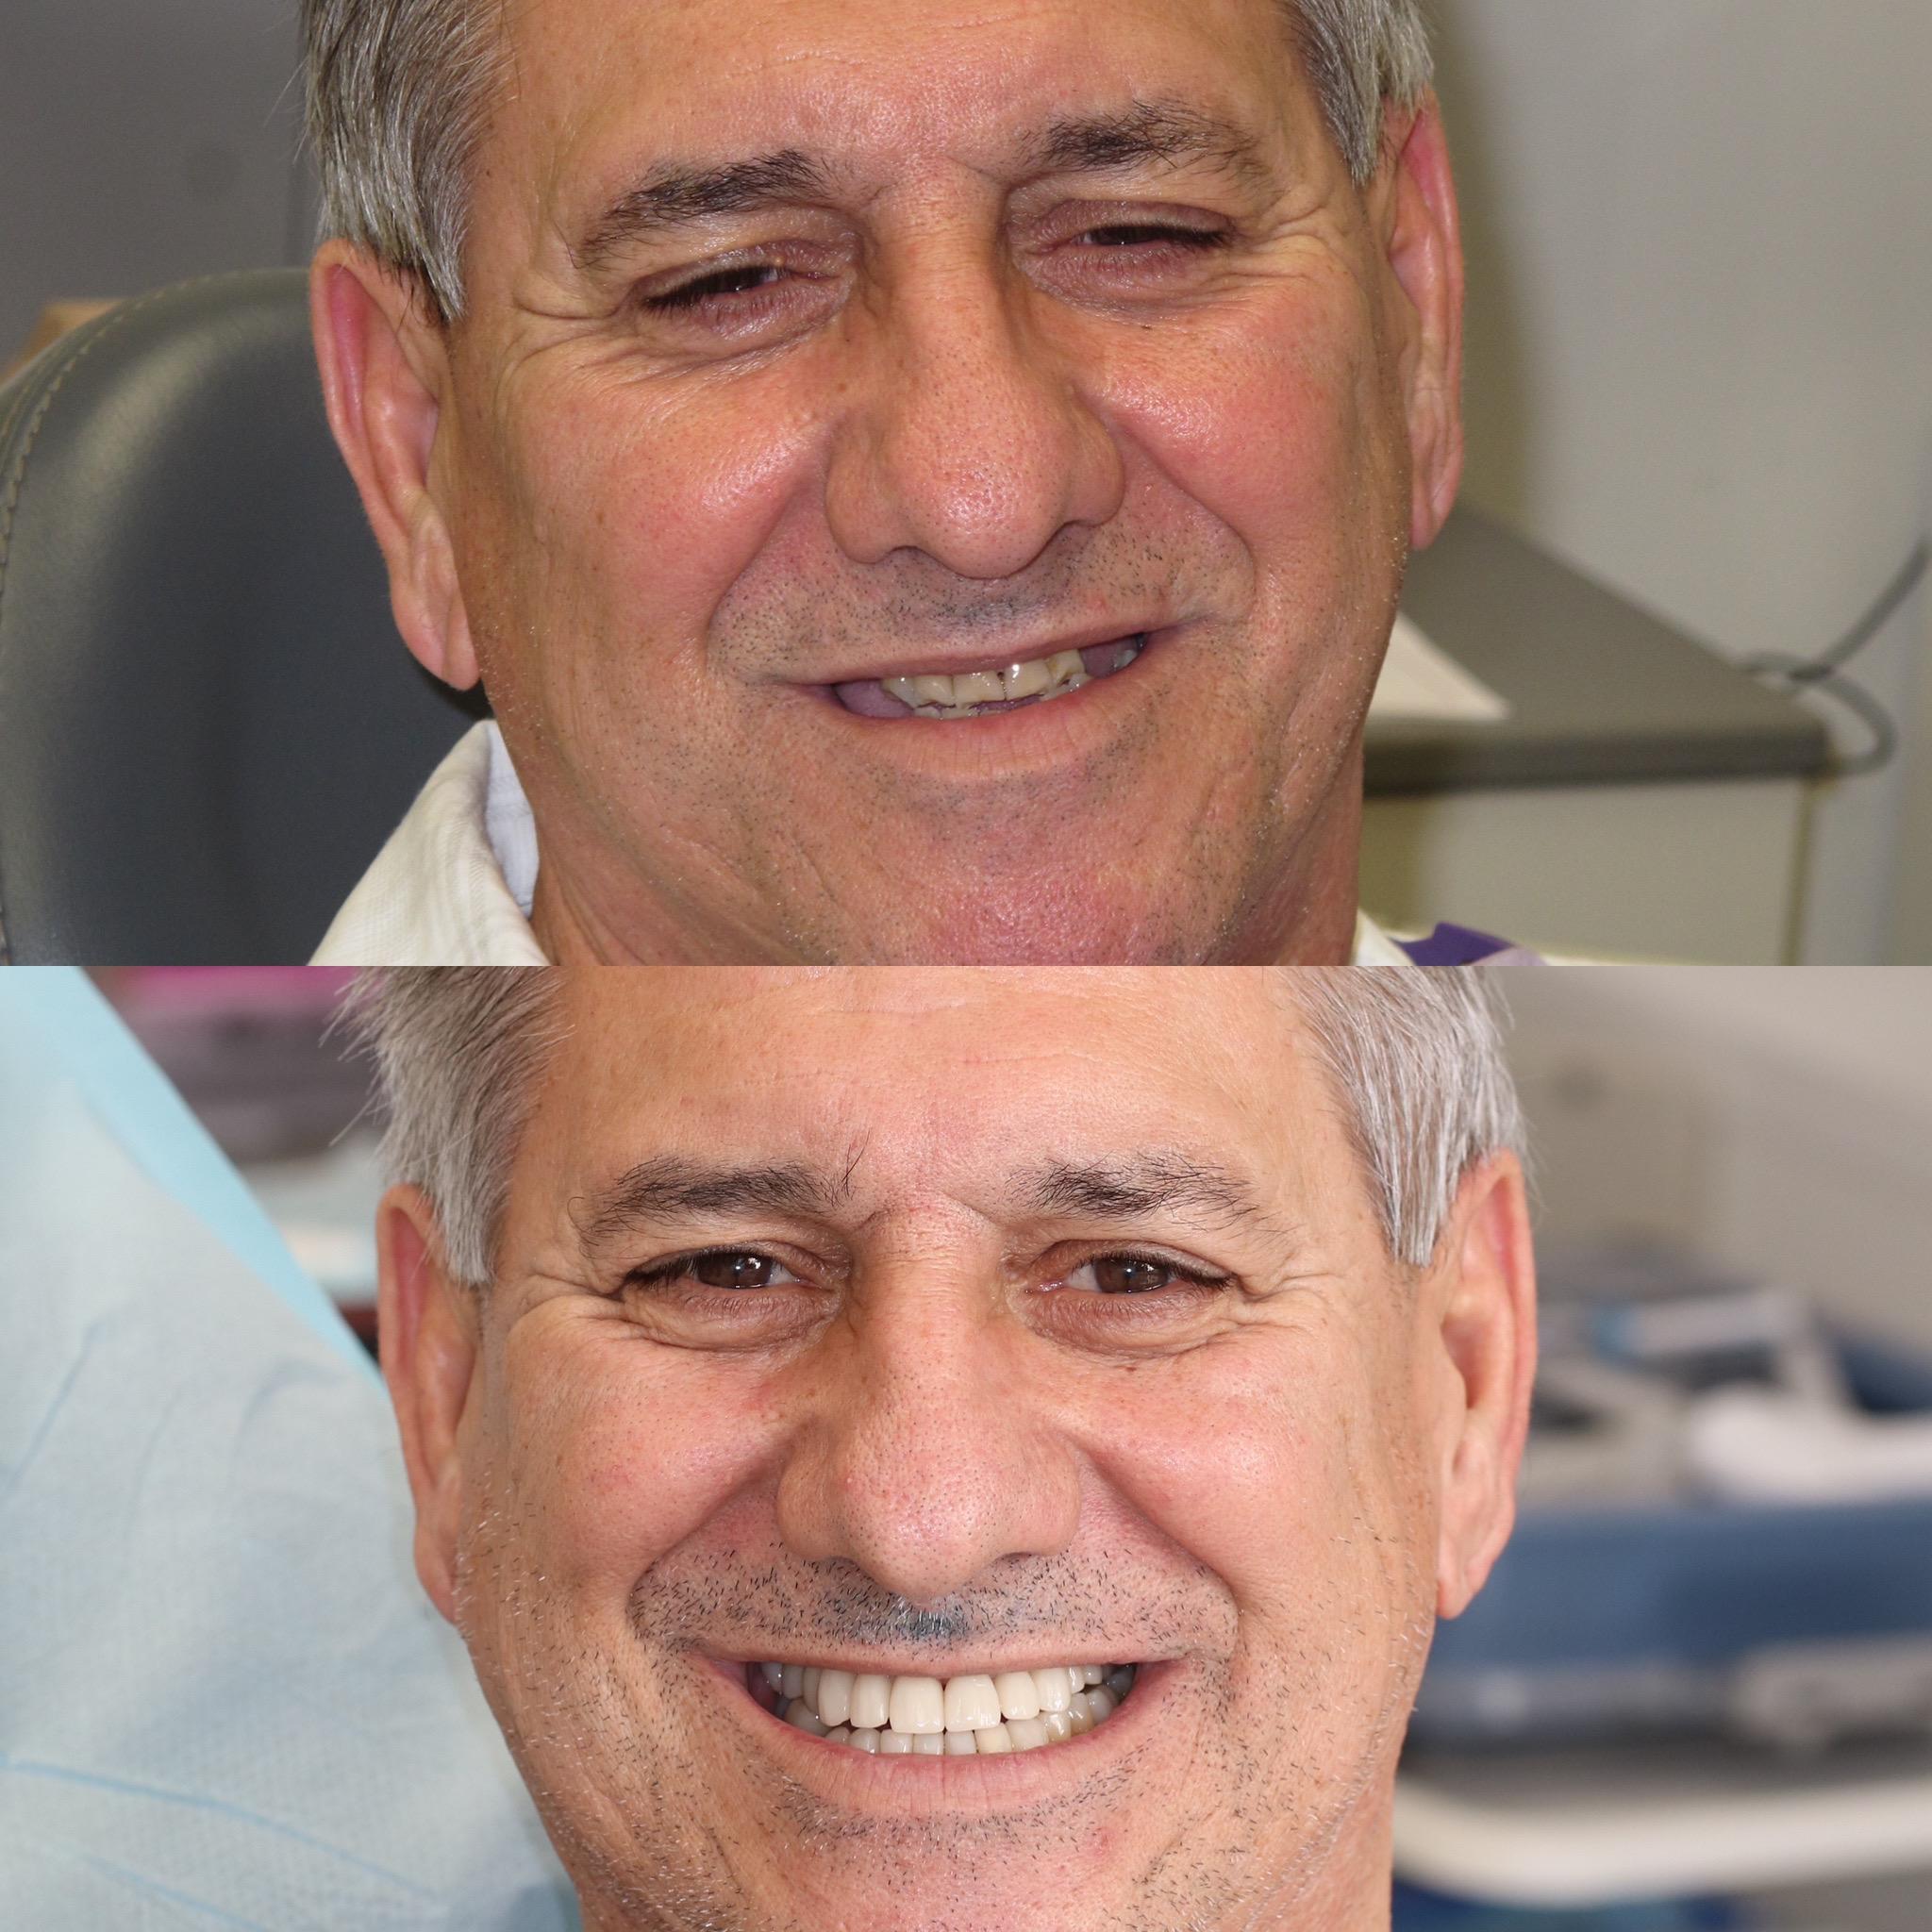 Dental Implant Case 54